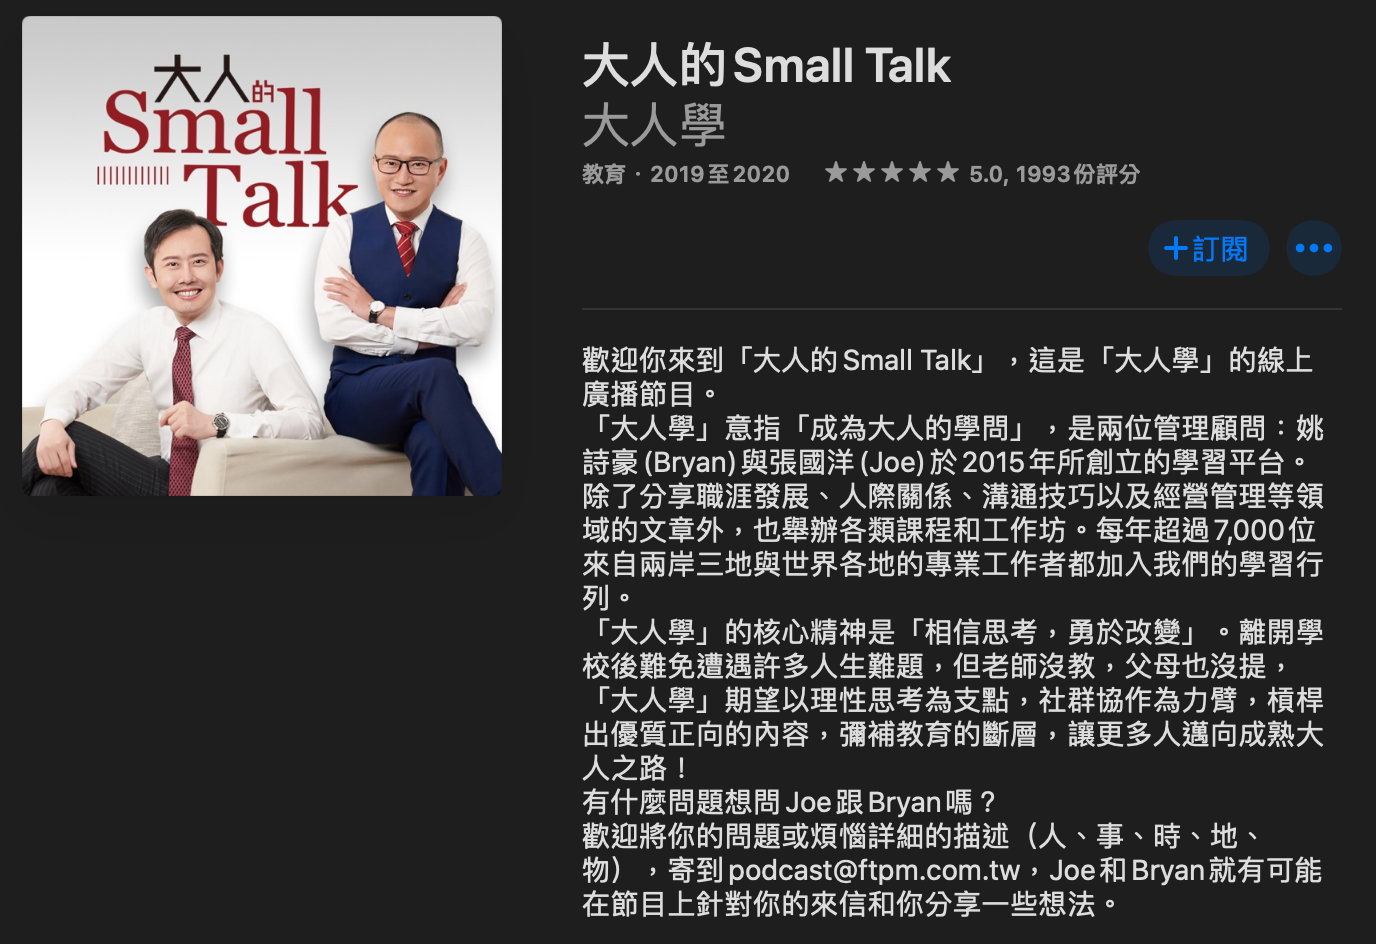 Podcast 節目大人學的 SmallTalk 將聽眾來信作為節目內容的靈感。